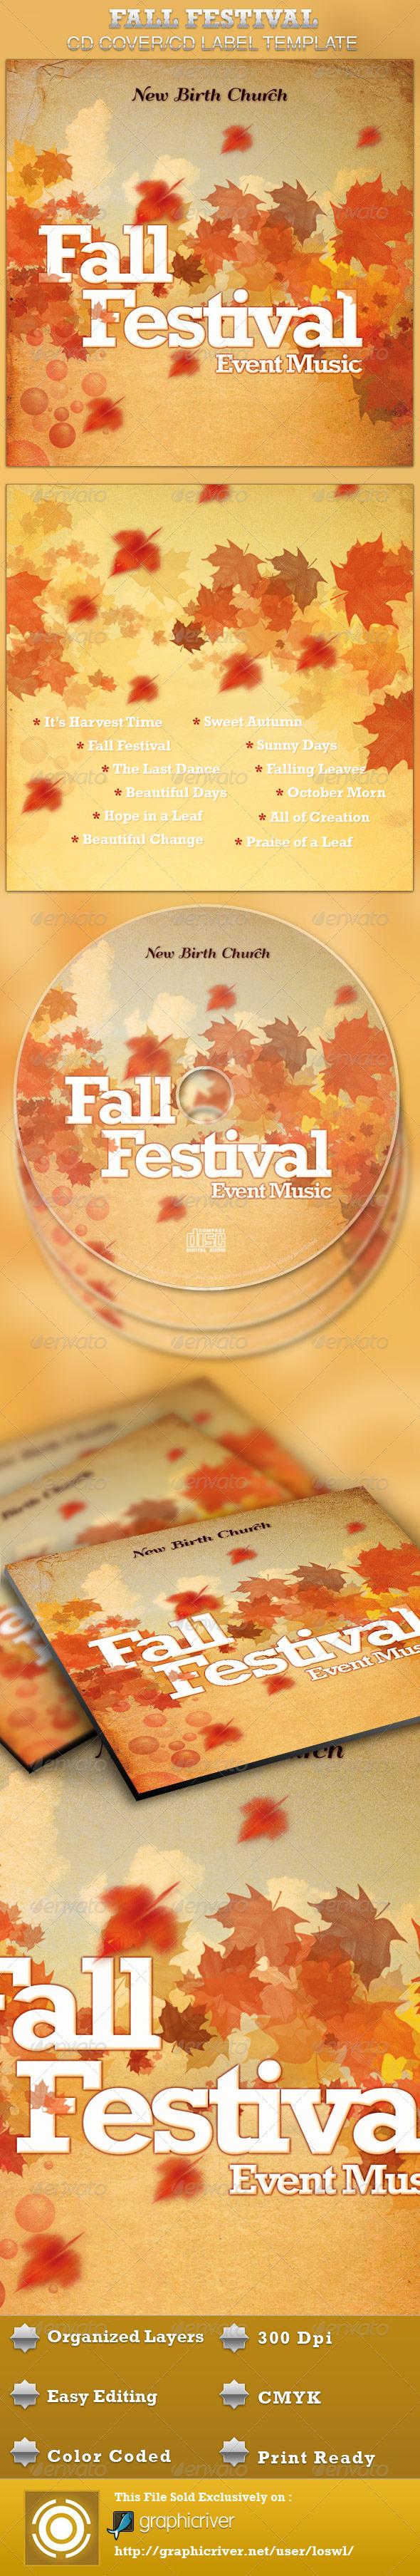 Fall Festival CD Artwork Template - CD & DVD Artwork Print Templates